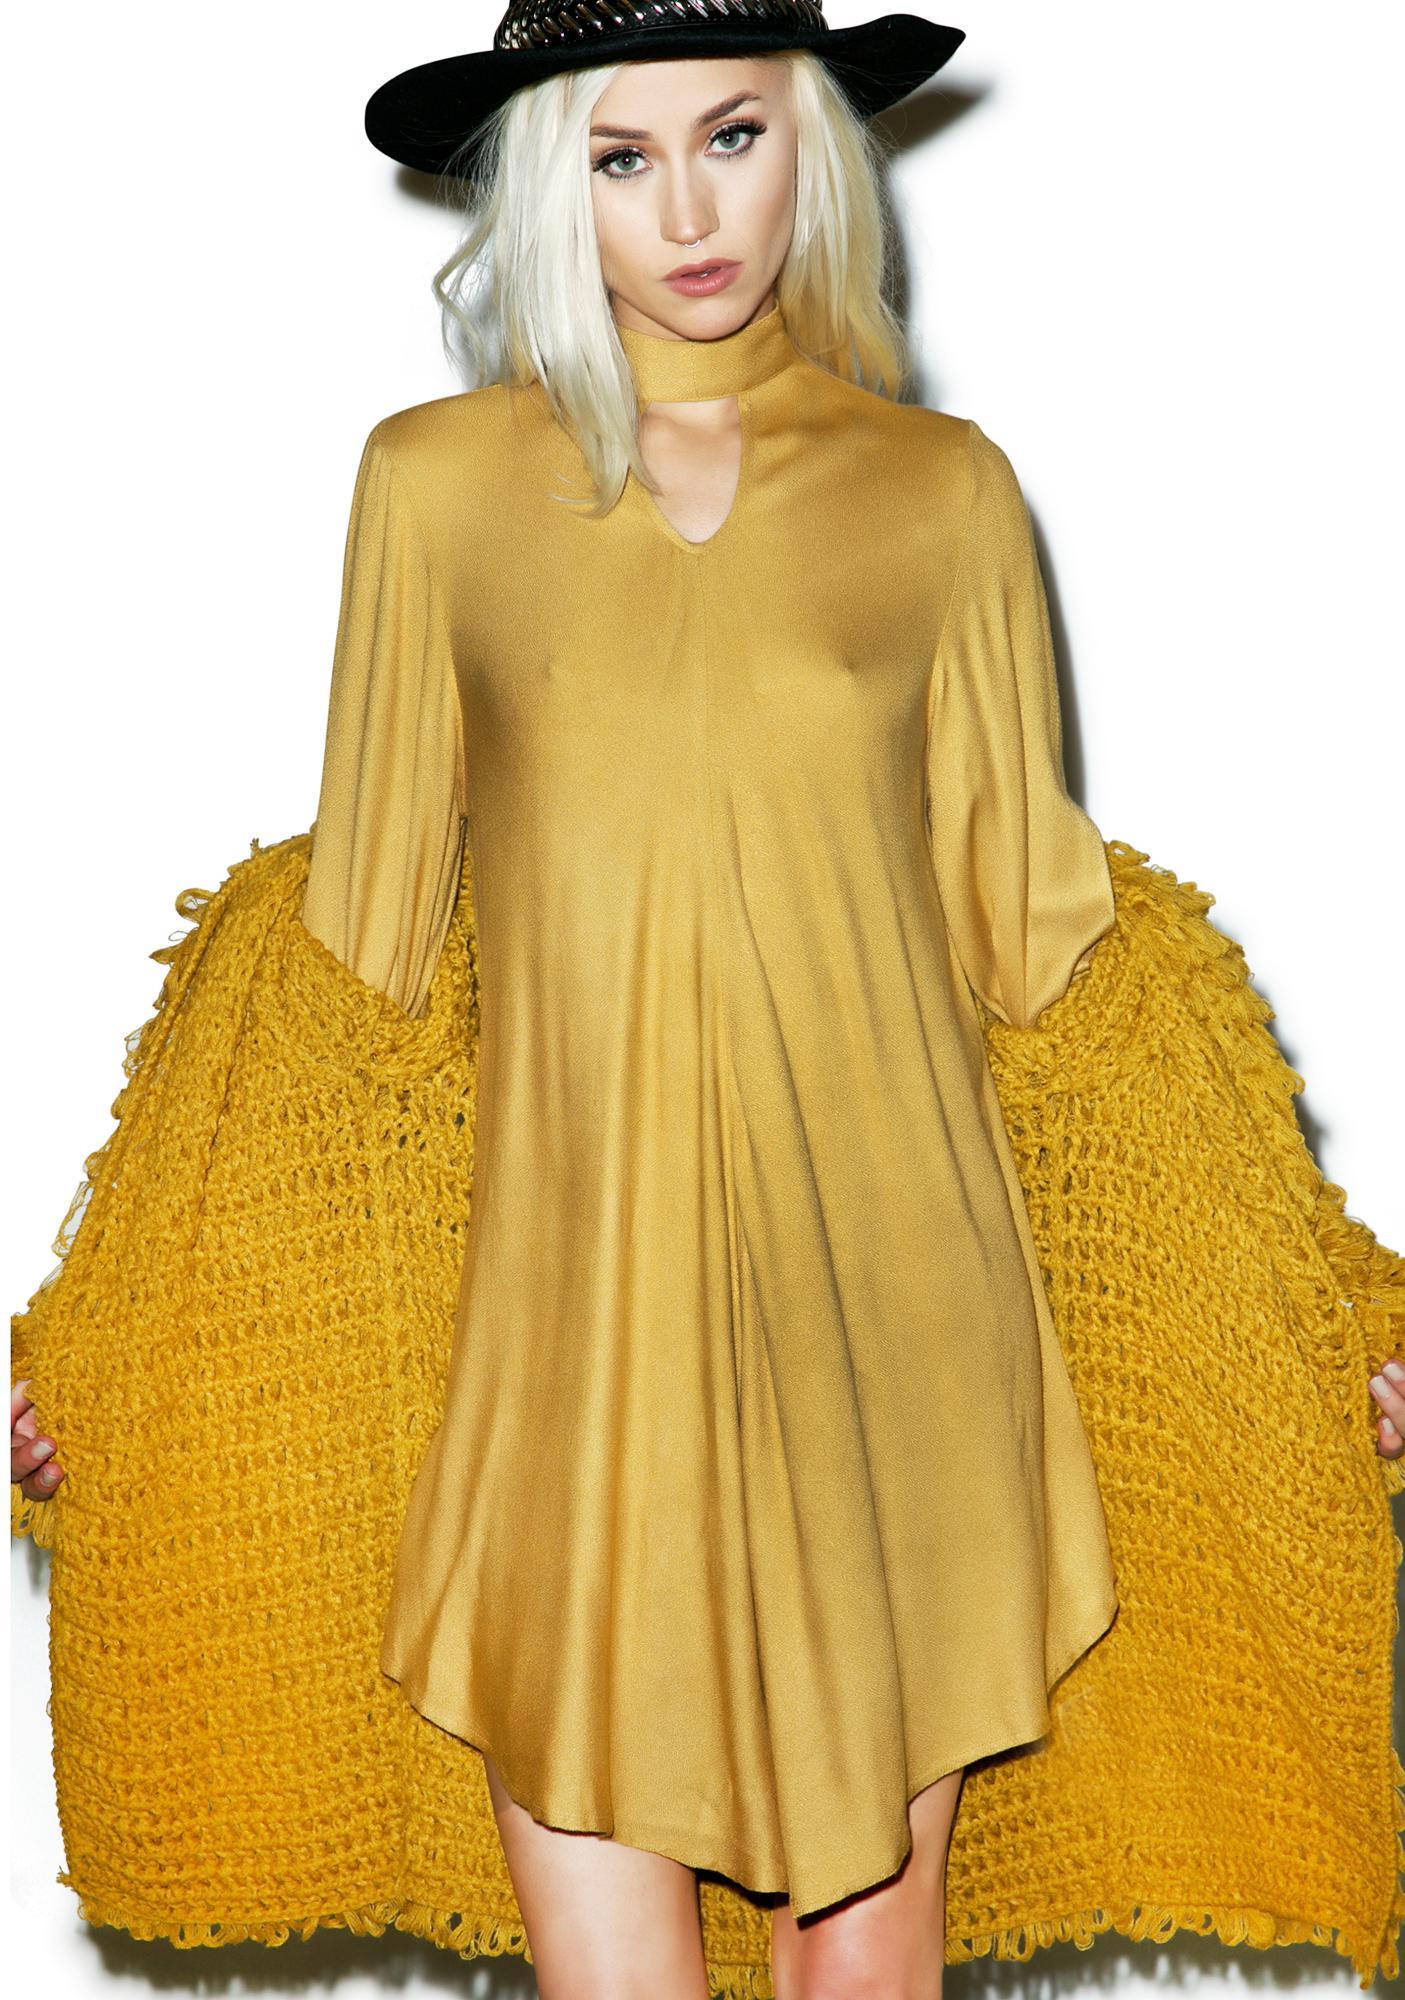 Sugarhigh + Lovestoned Goldenrod Marianne Faithful Dress